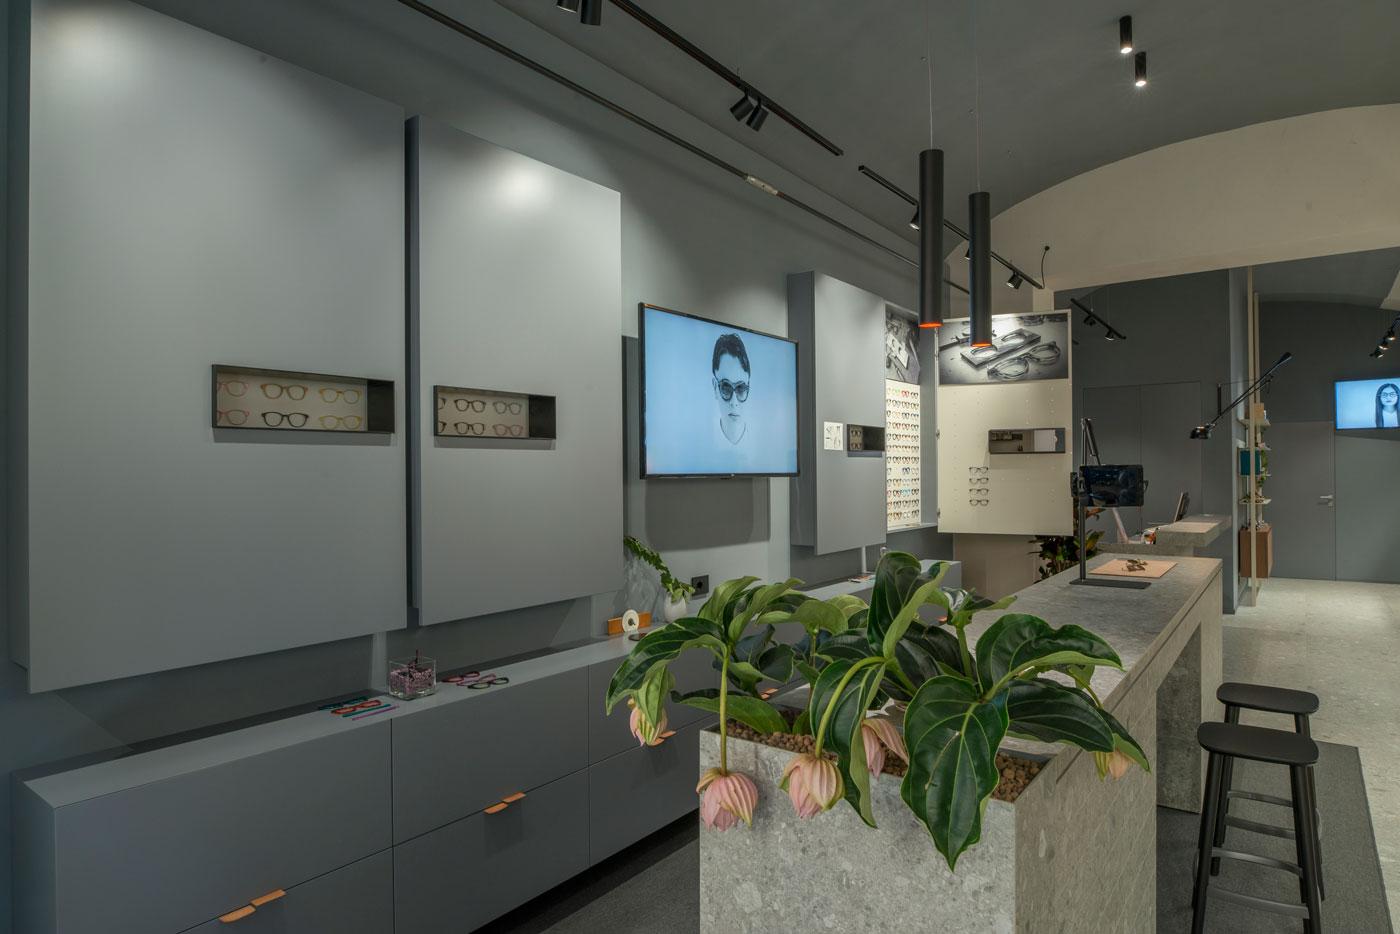 lab-centro-ottico-emmedue-spoleto-3